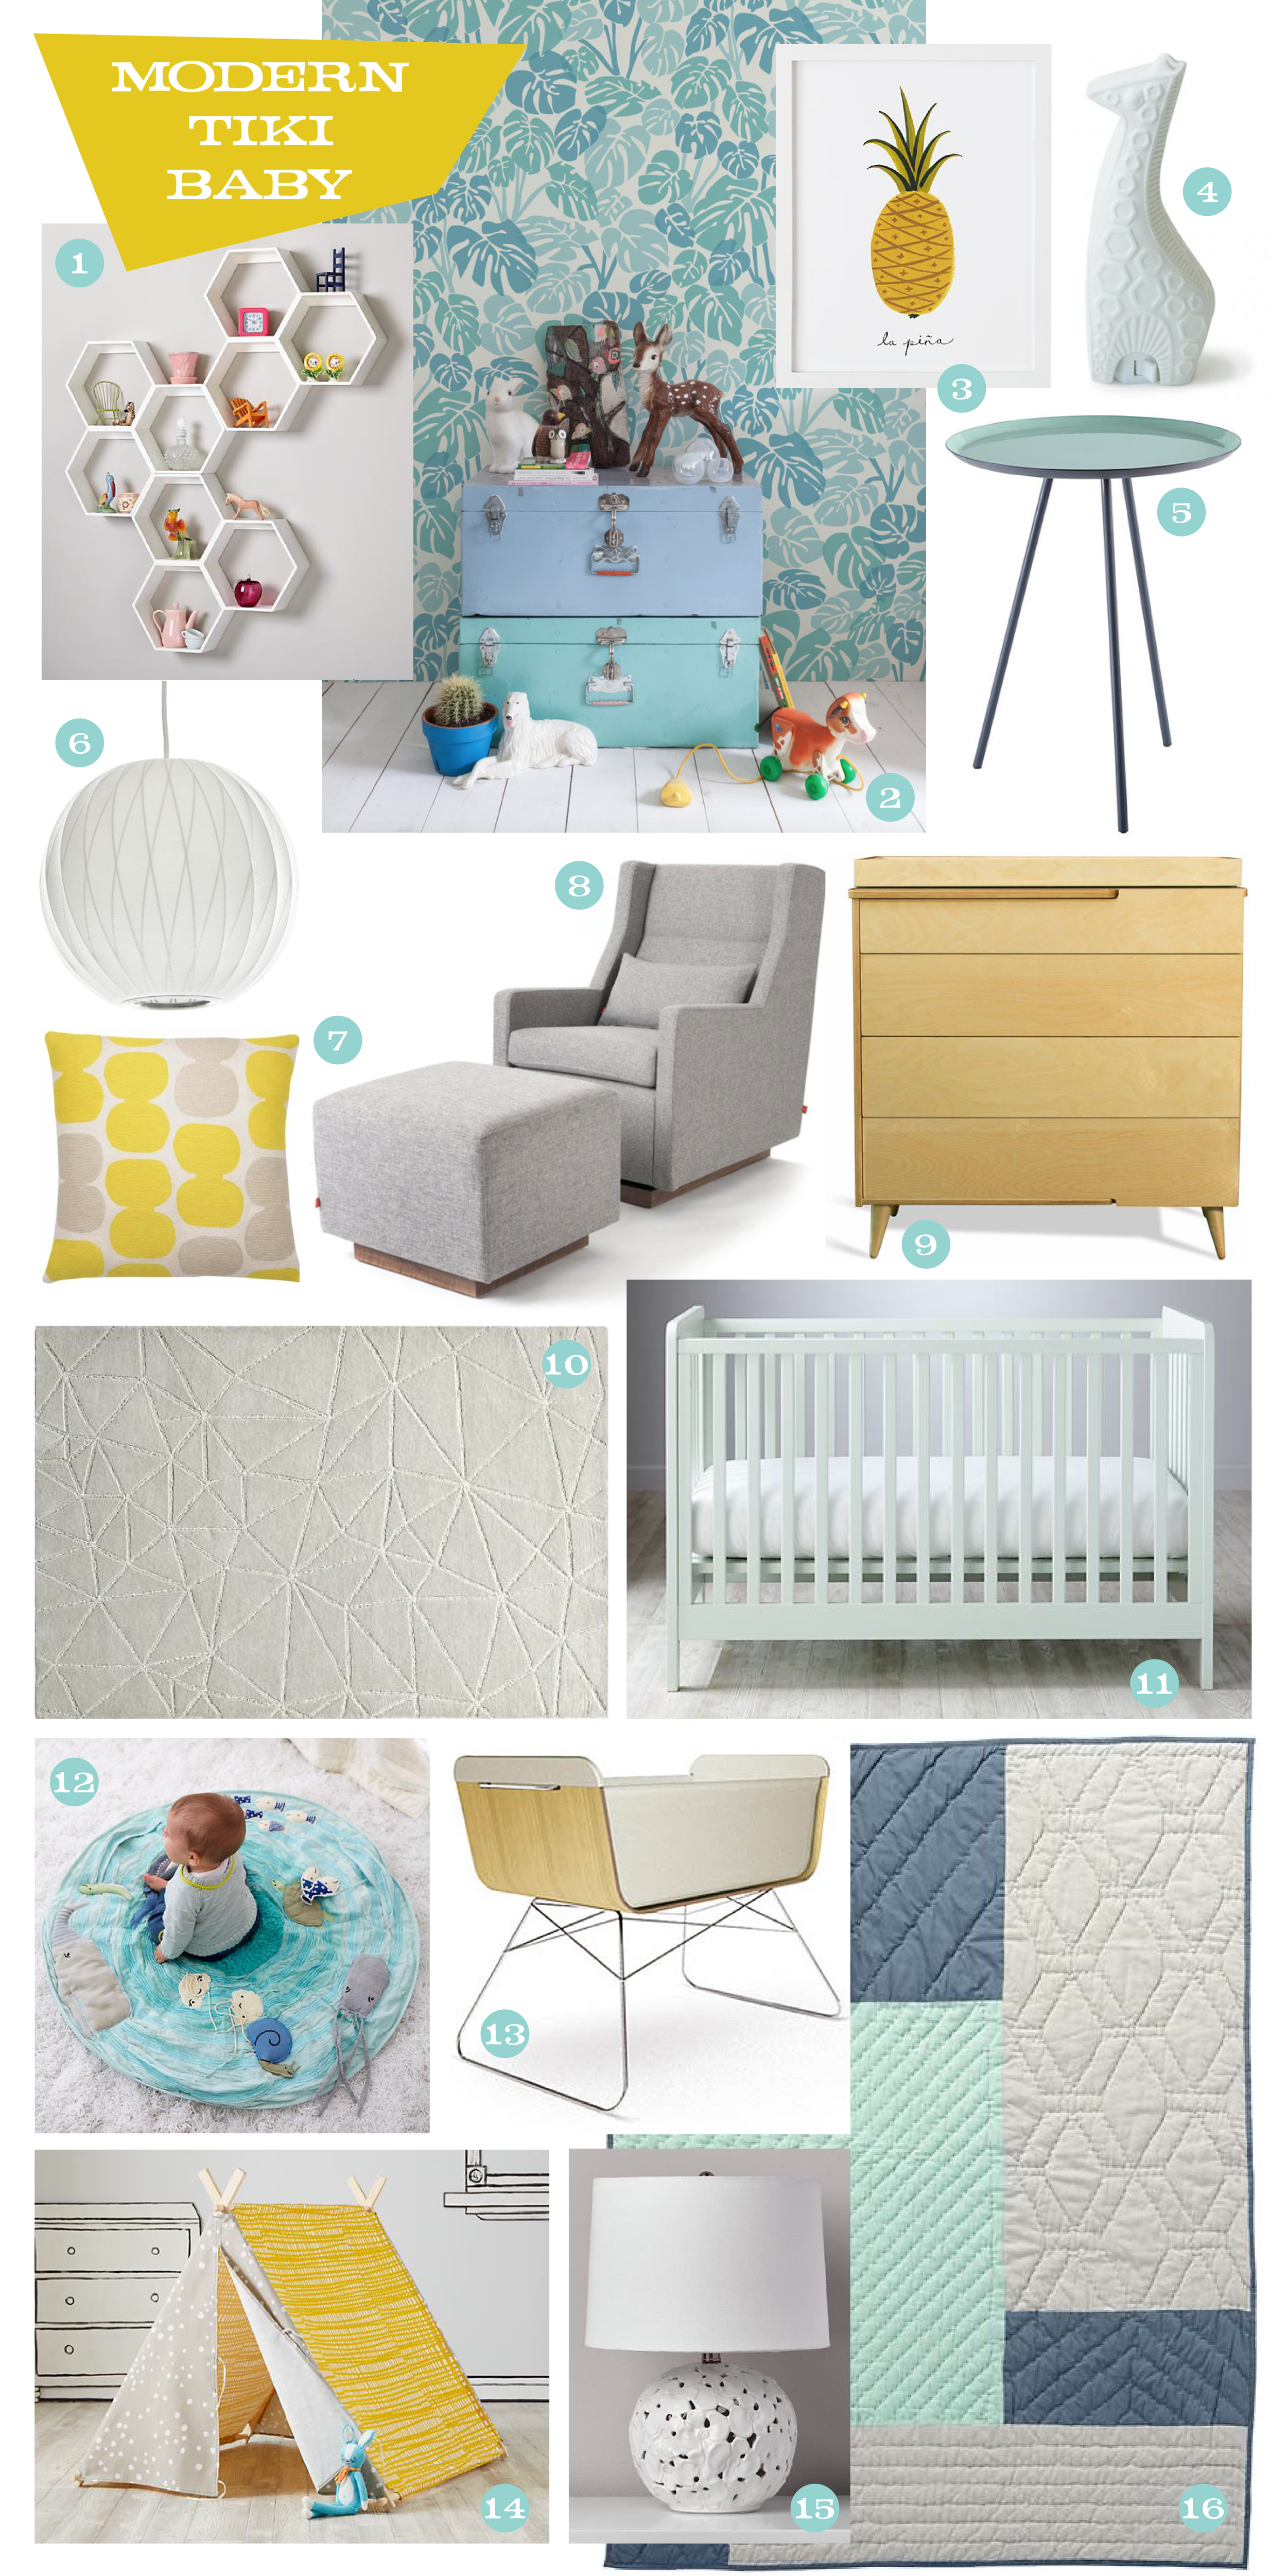 16 Must-Have Nursery Items for the Modern Tiki Baby — Modern Tiki